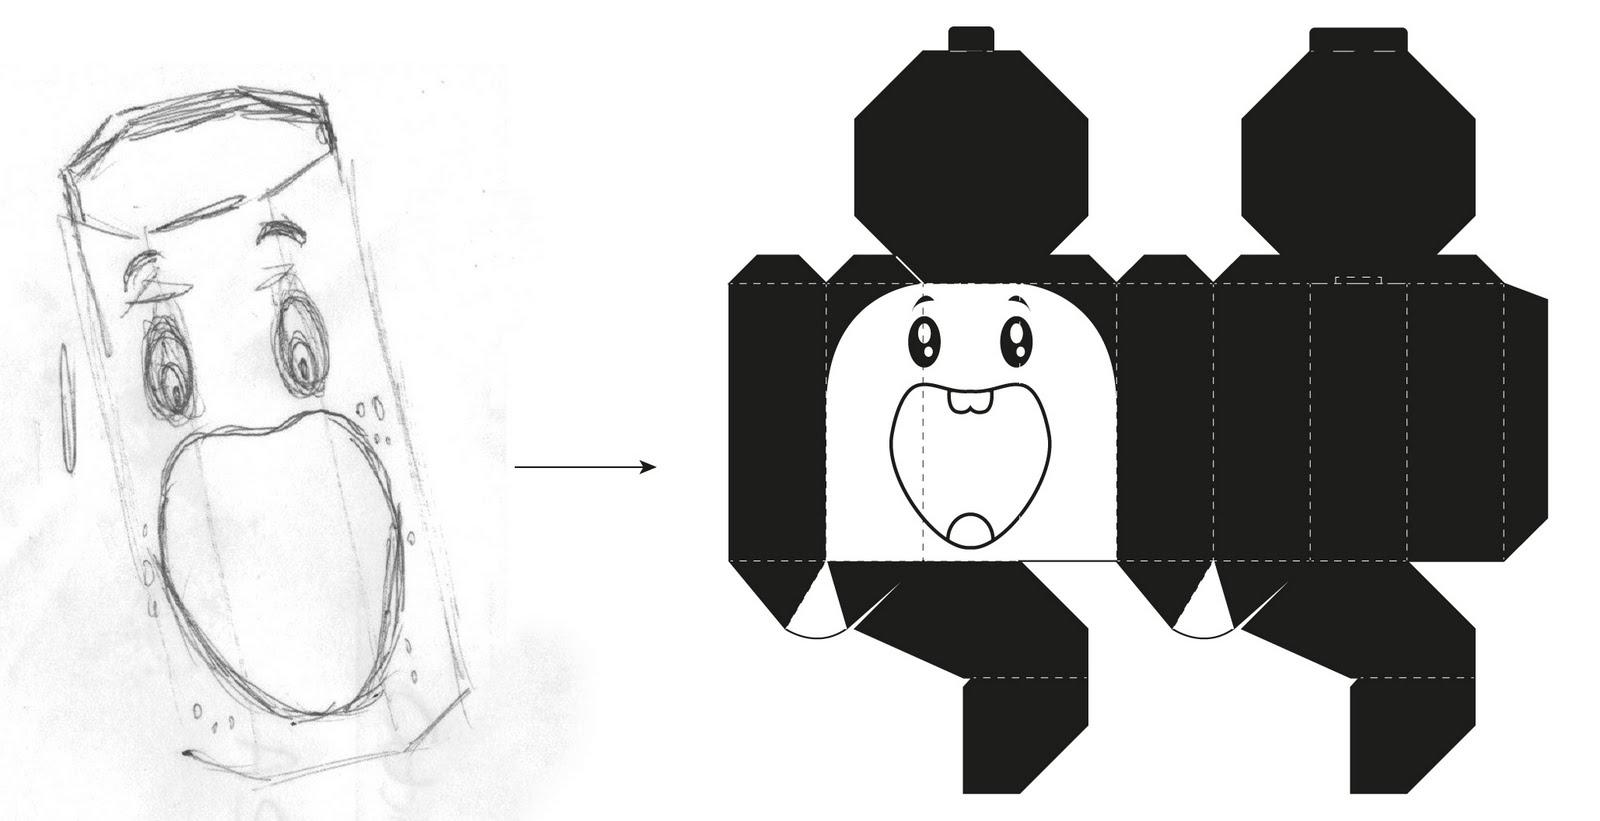 jack3l designs: Packaging - Doughnut 5Pack